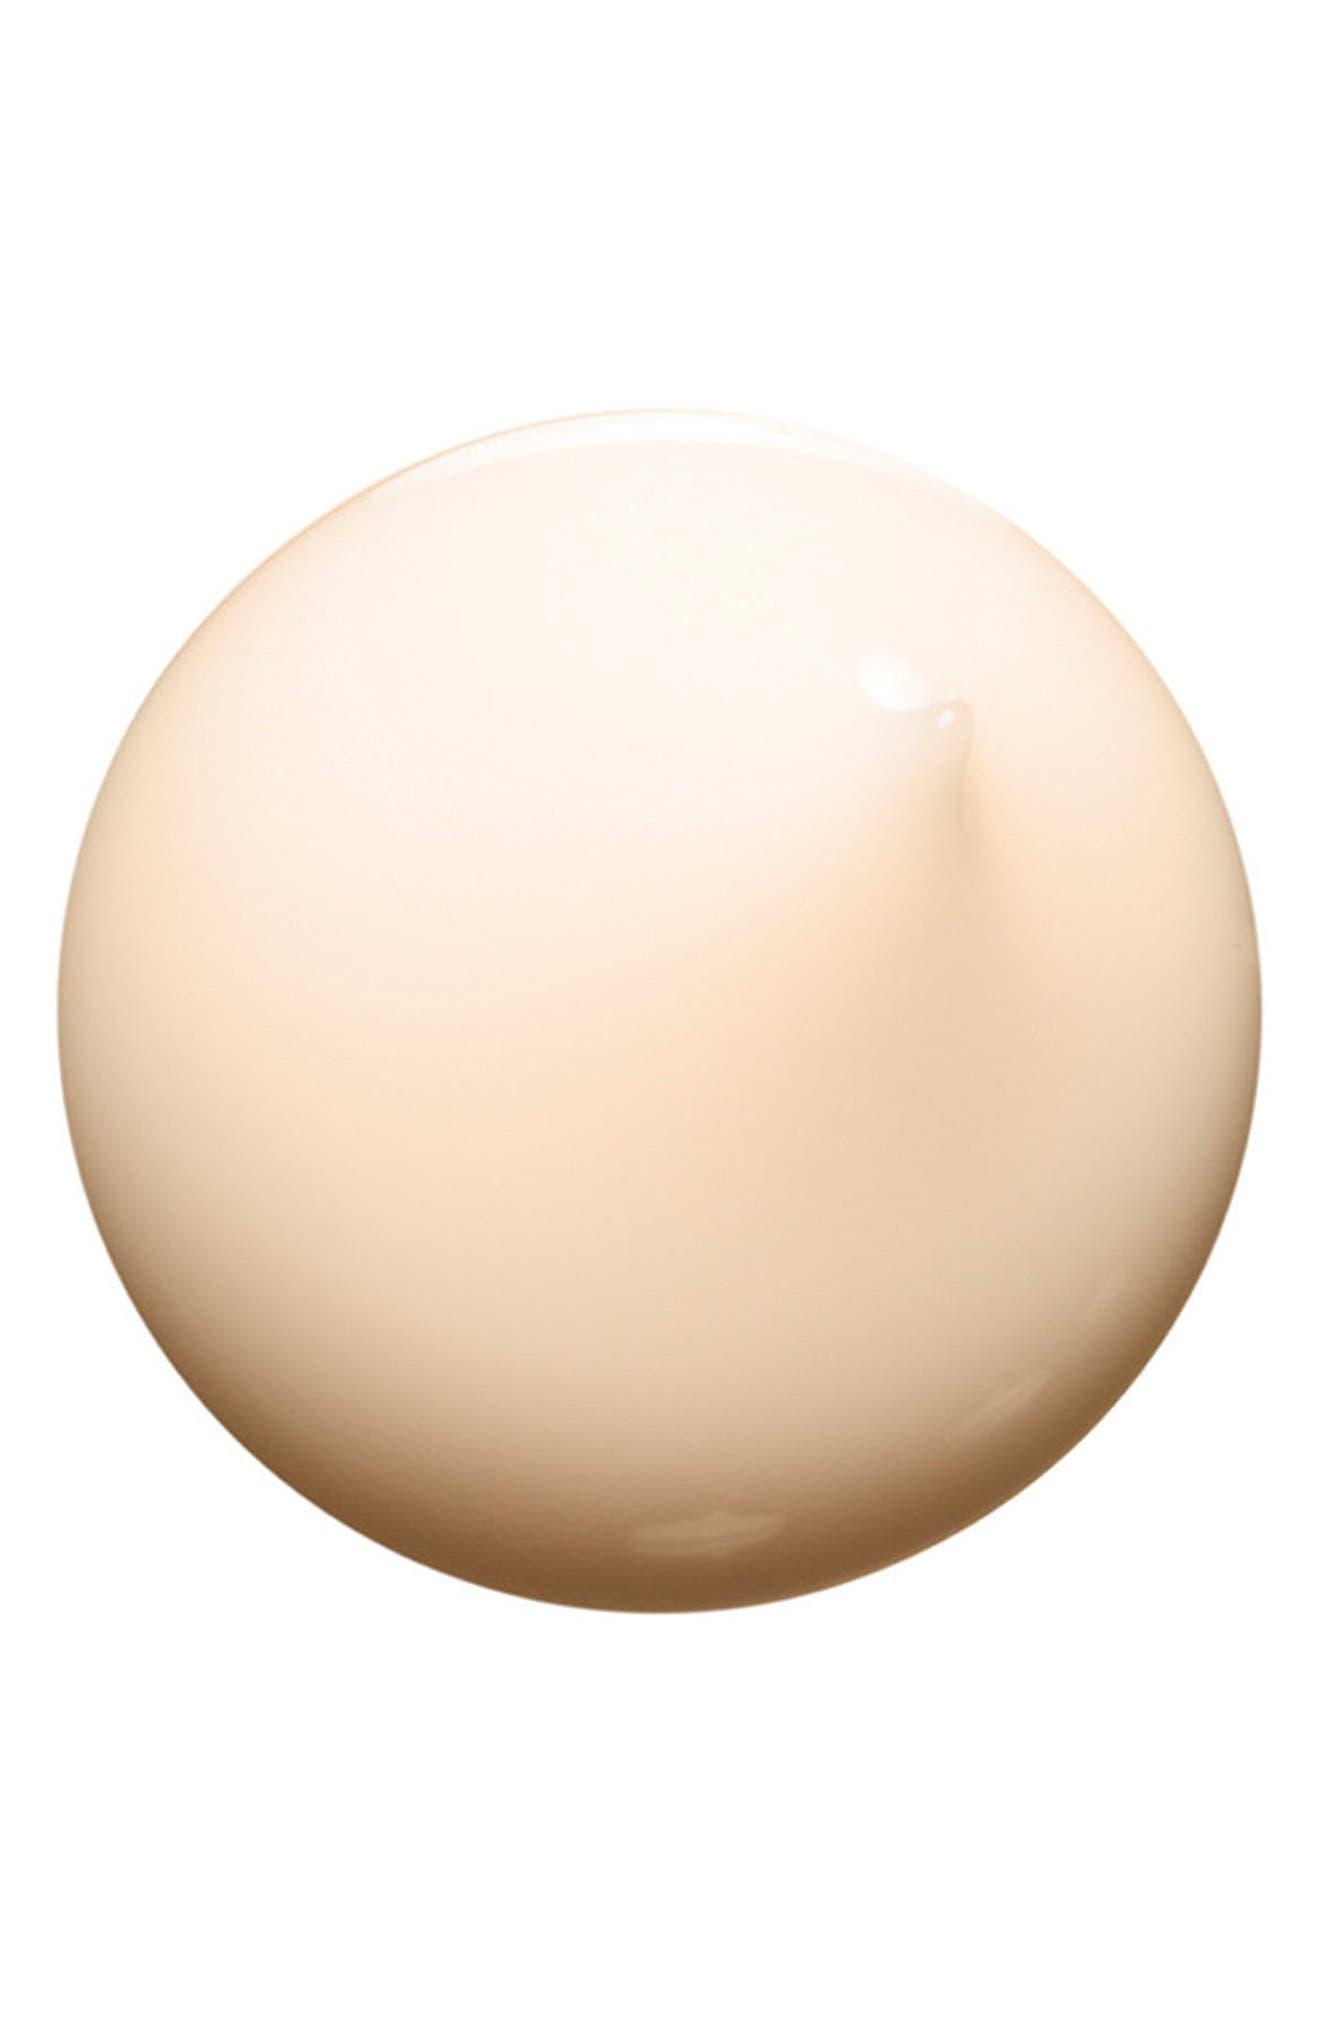 CLARINS,                             Super Restorative Redefining Body Care Cream for Abdomen and Waist,                             Alternate thumbnail 2, color,                             NO COLOR